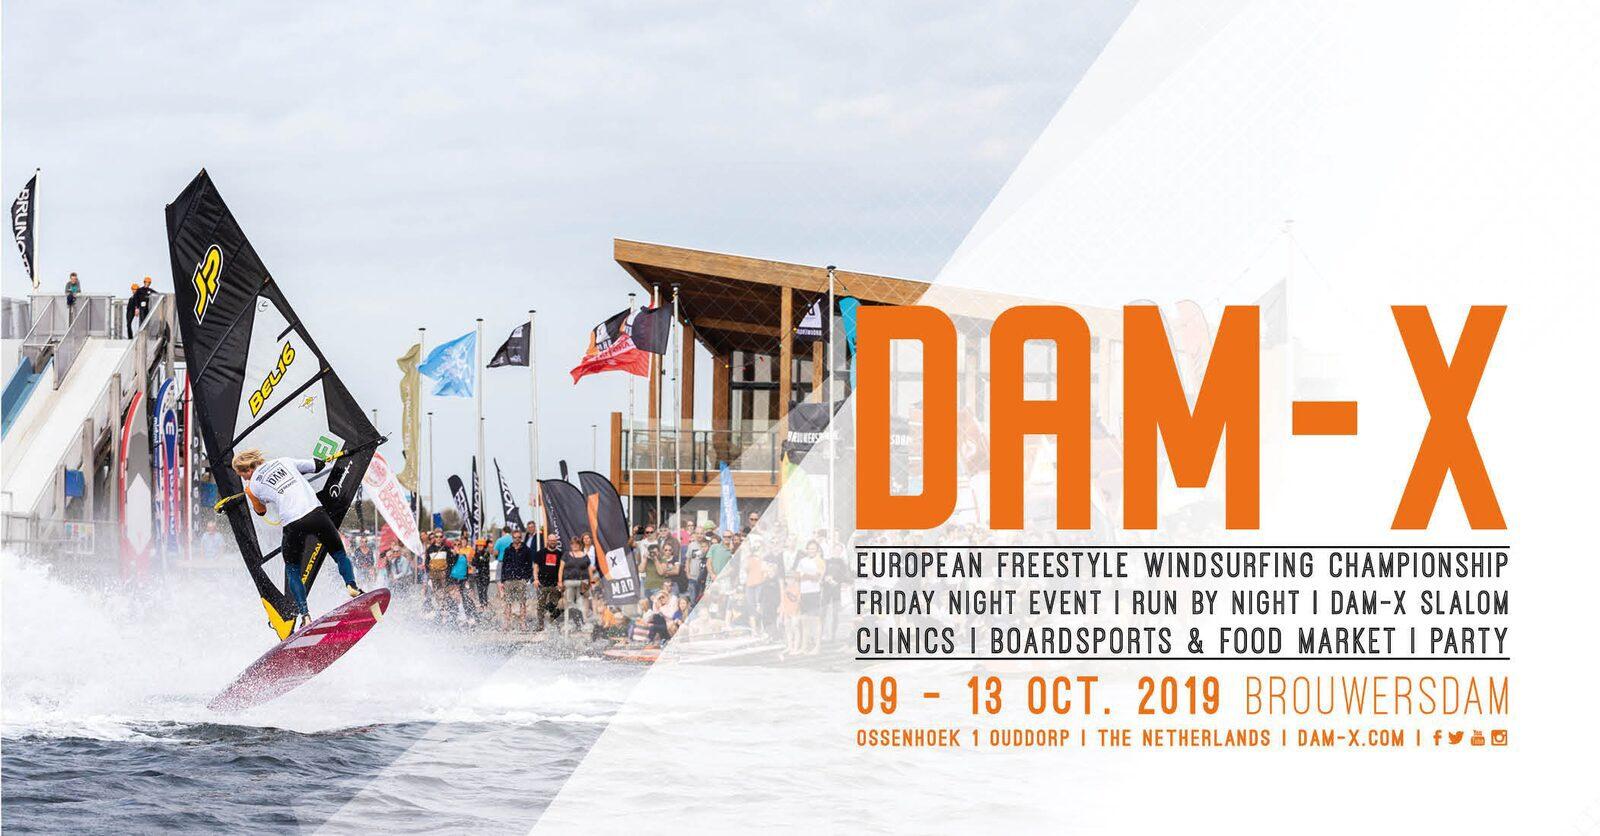 DAM-X